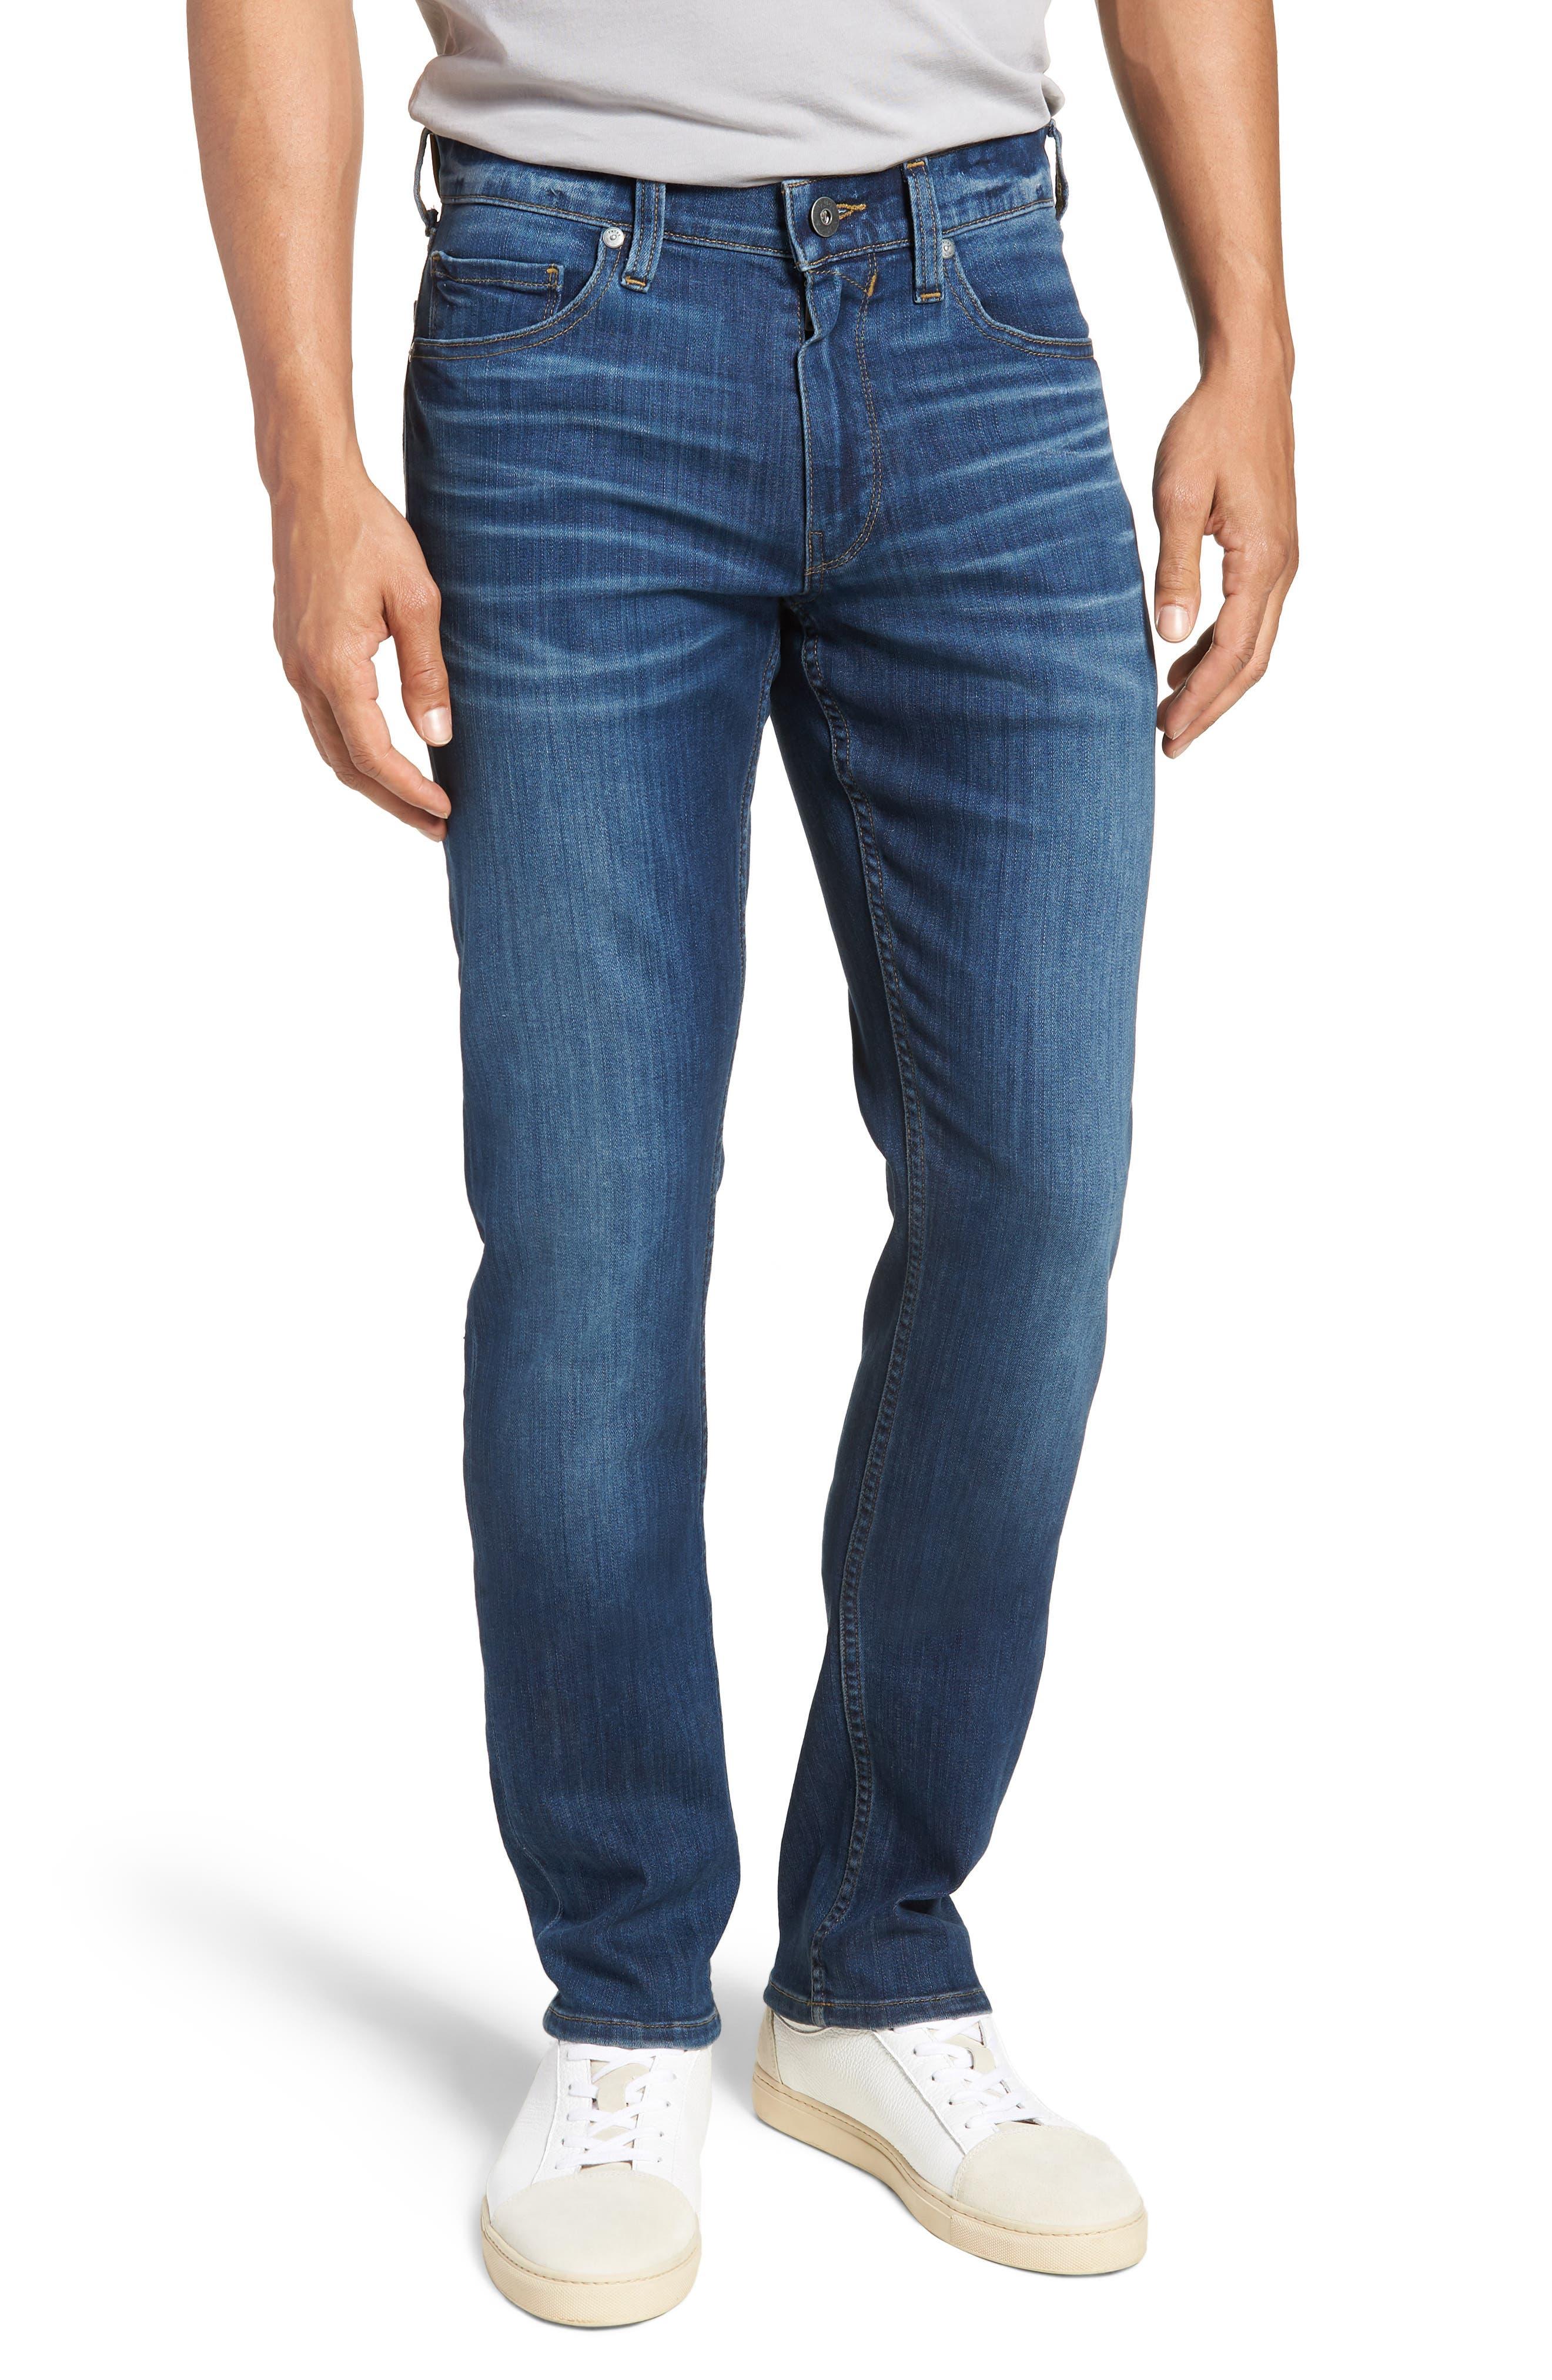 Transcend - Lennox Slim Fit Jeans,                             Main thumbnail 1, color,                             Ashbrook